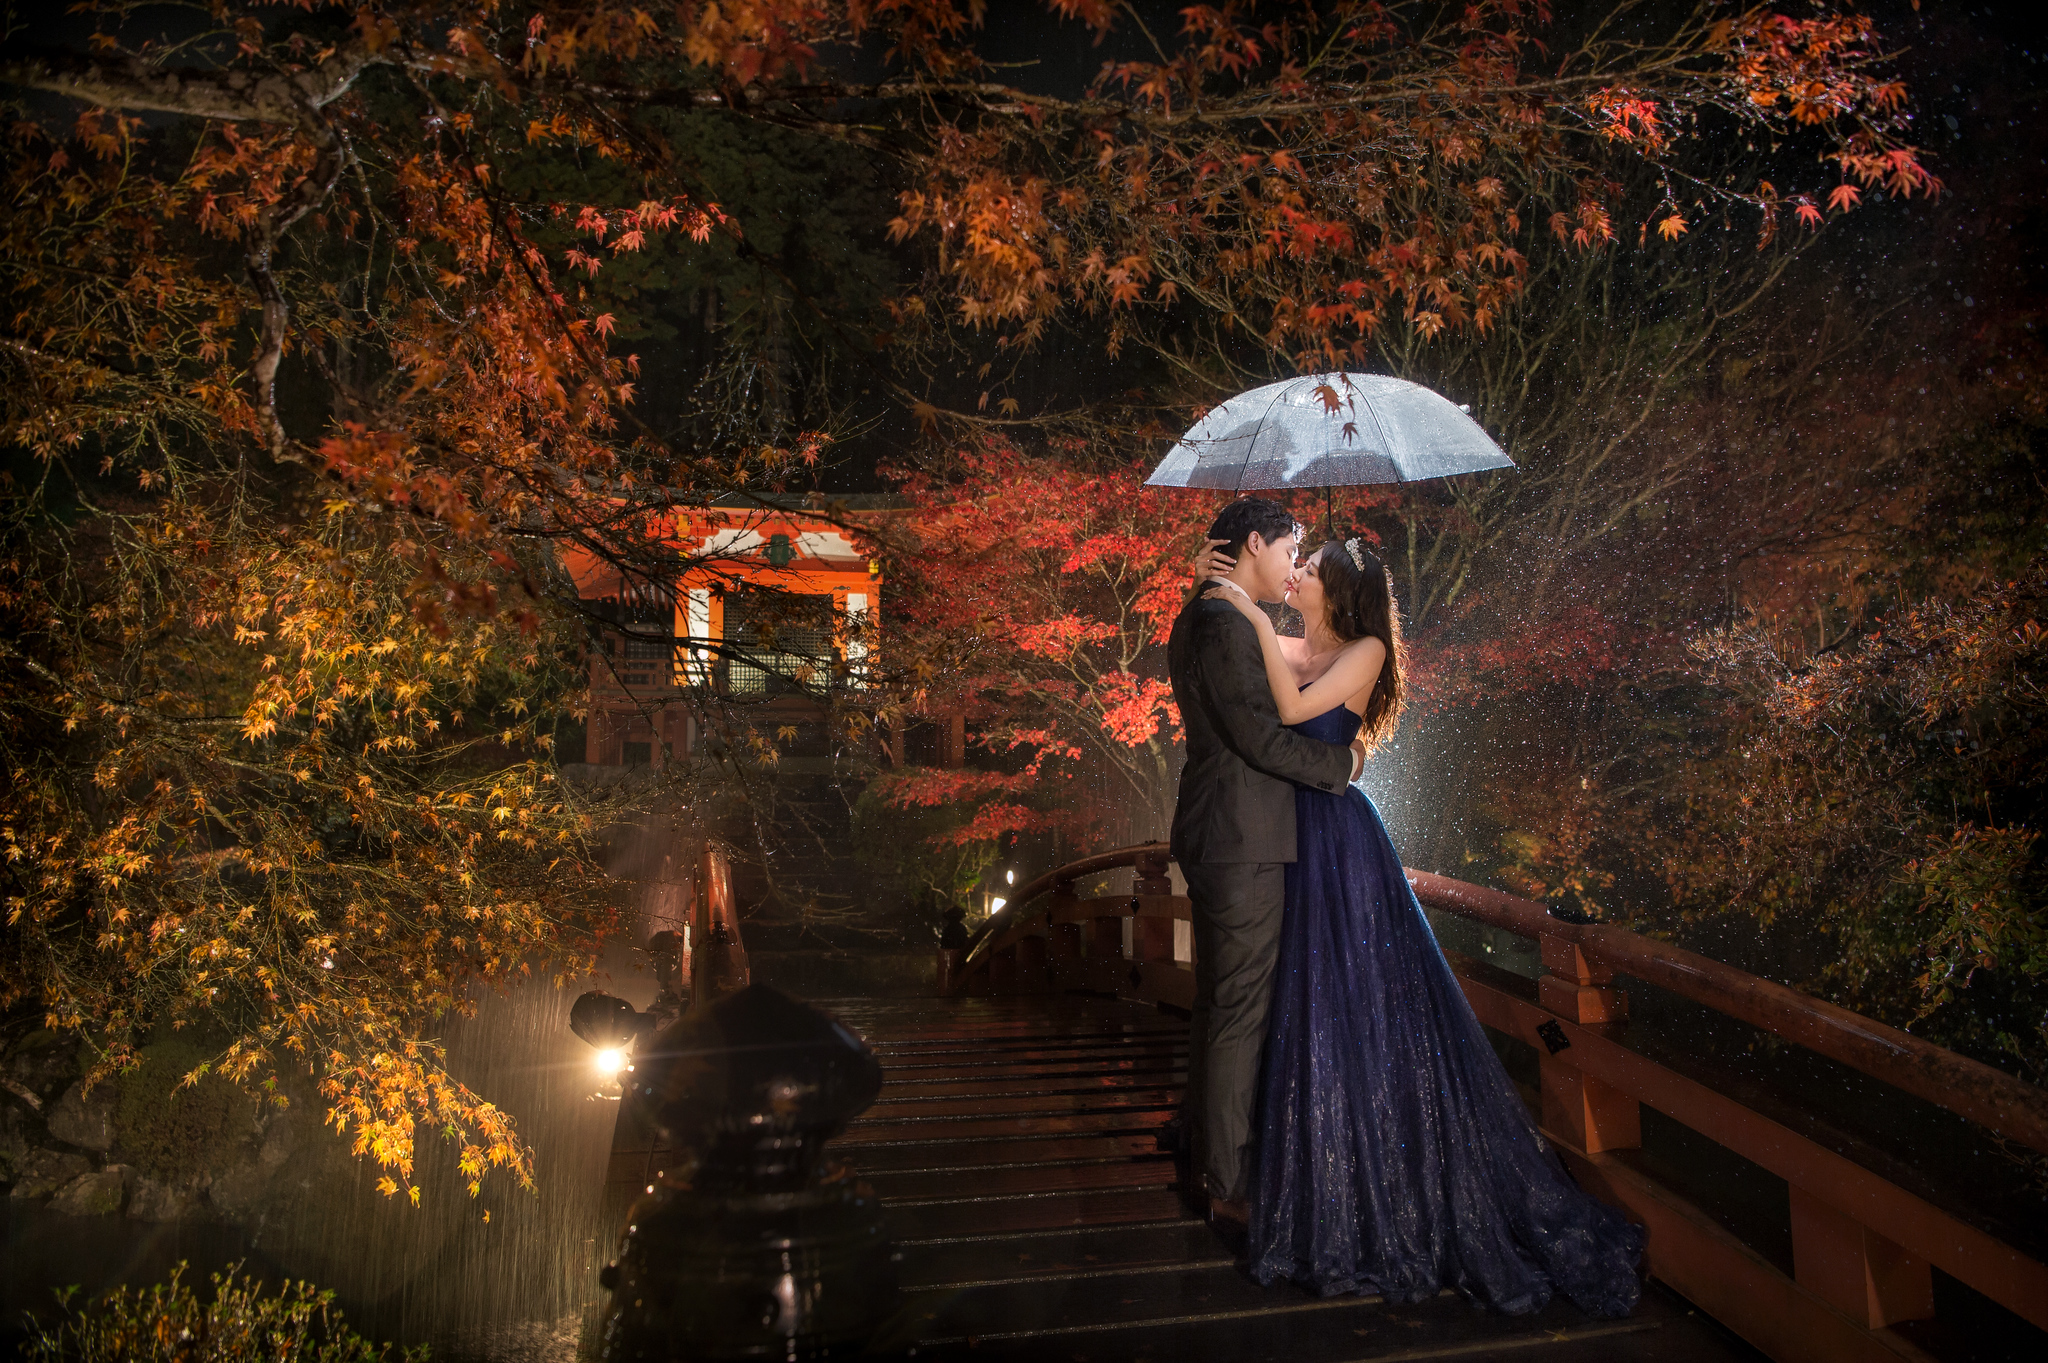 Donfer, 海外婚紗, World tour, 東法, EASTERN WEDDING, 世界旅拍, 京都, Kyoto, 京都婚紗